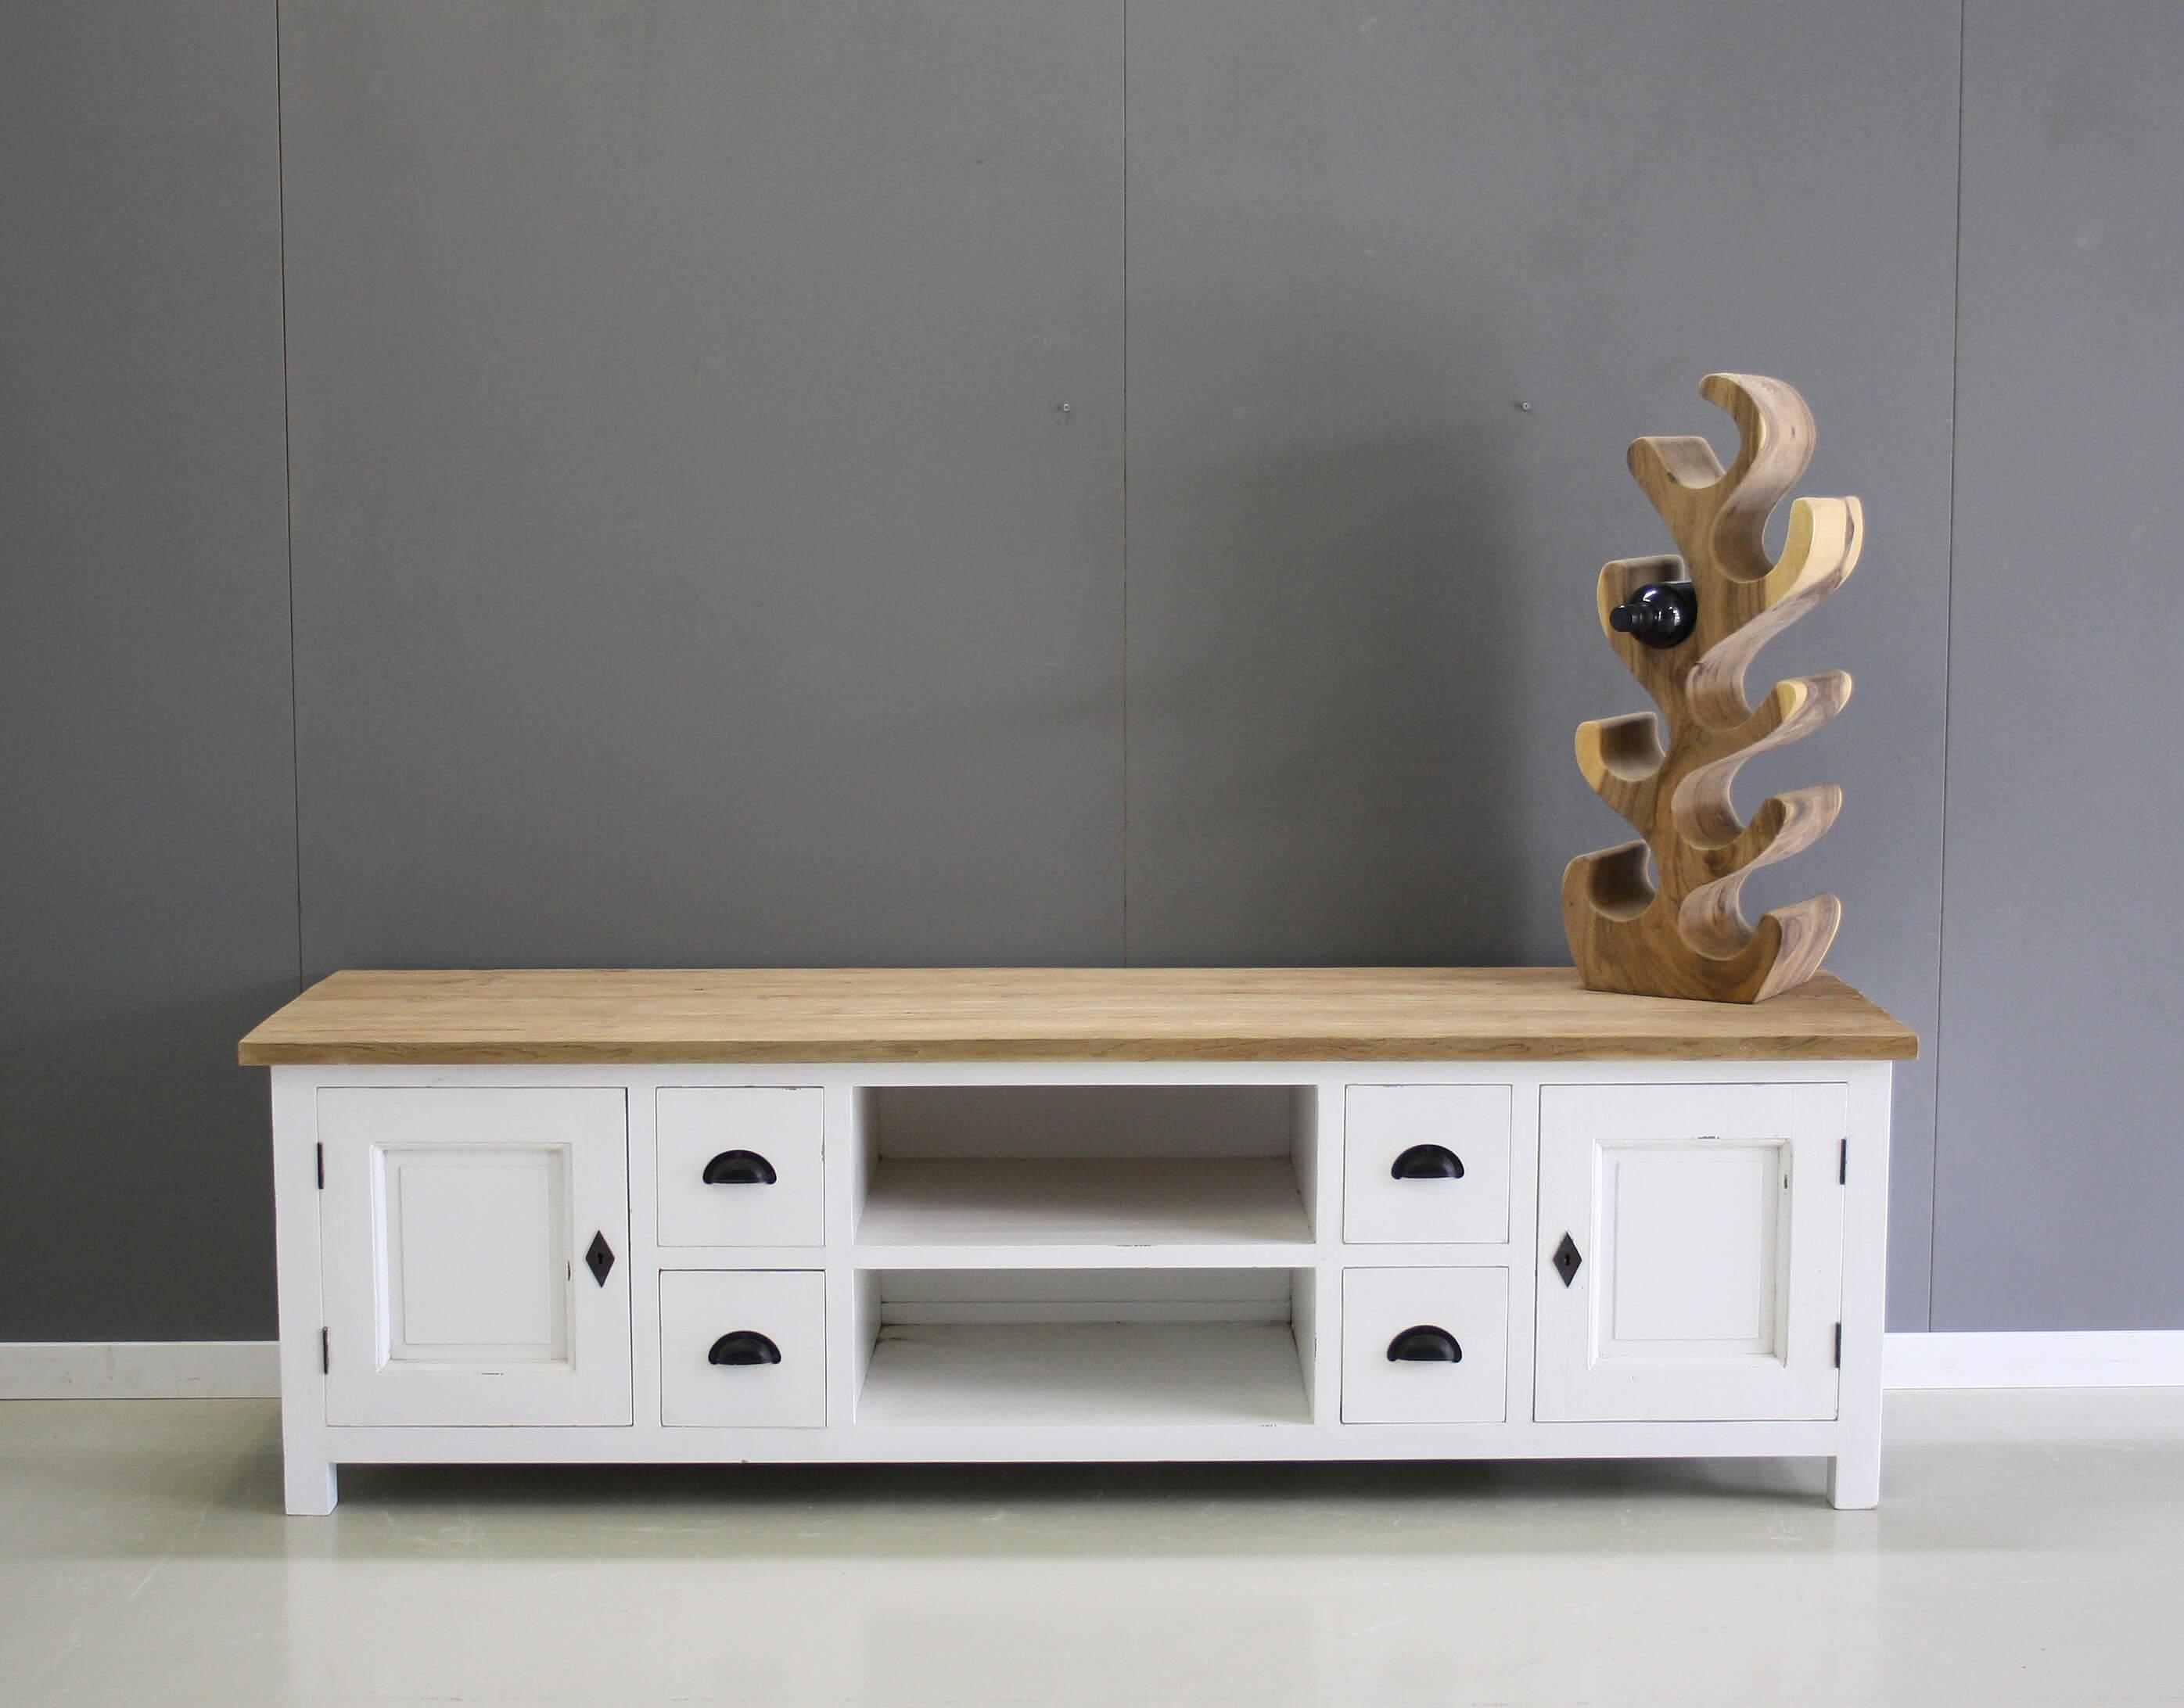 Tv Kast Teak : Meubel teak tv meubel metal teak collectie cabinet search items